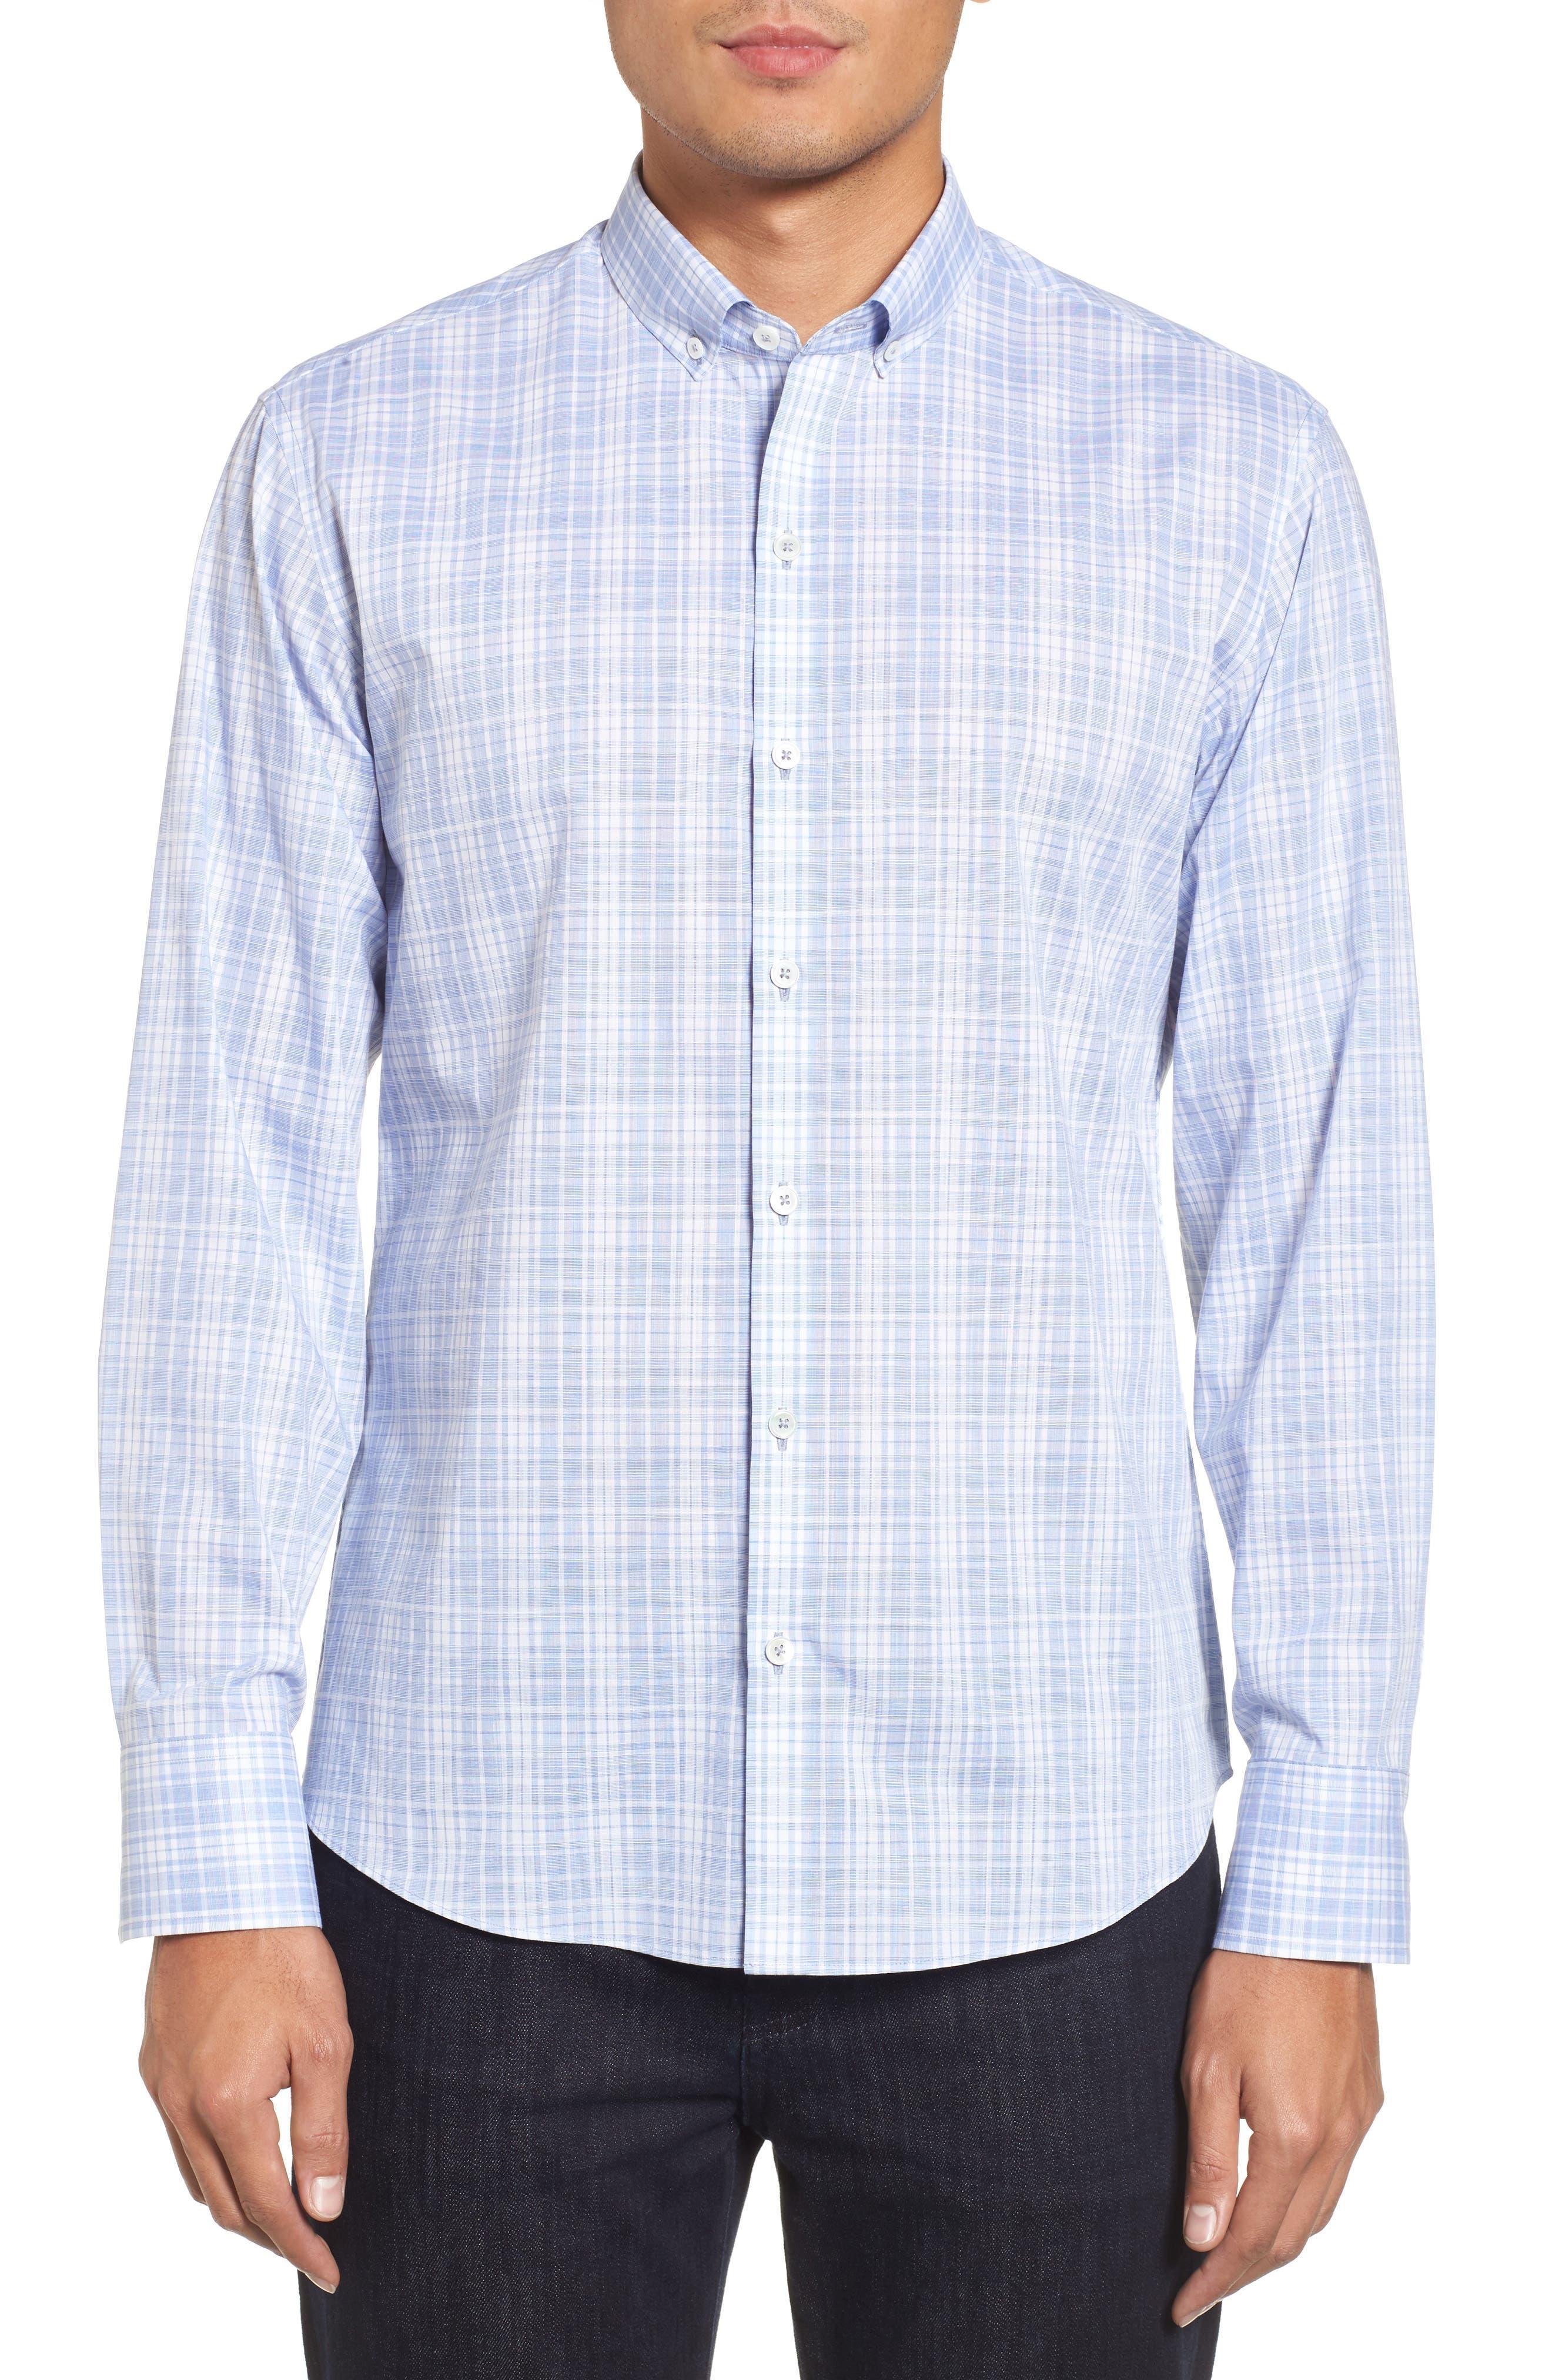 Cochran Slim Fit Plaid Sport Shirt,                             Main thumbnail 1, color,                             BLUE